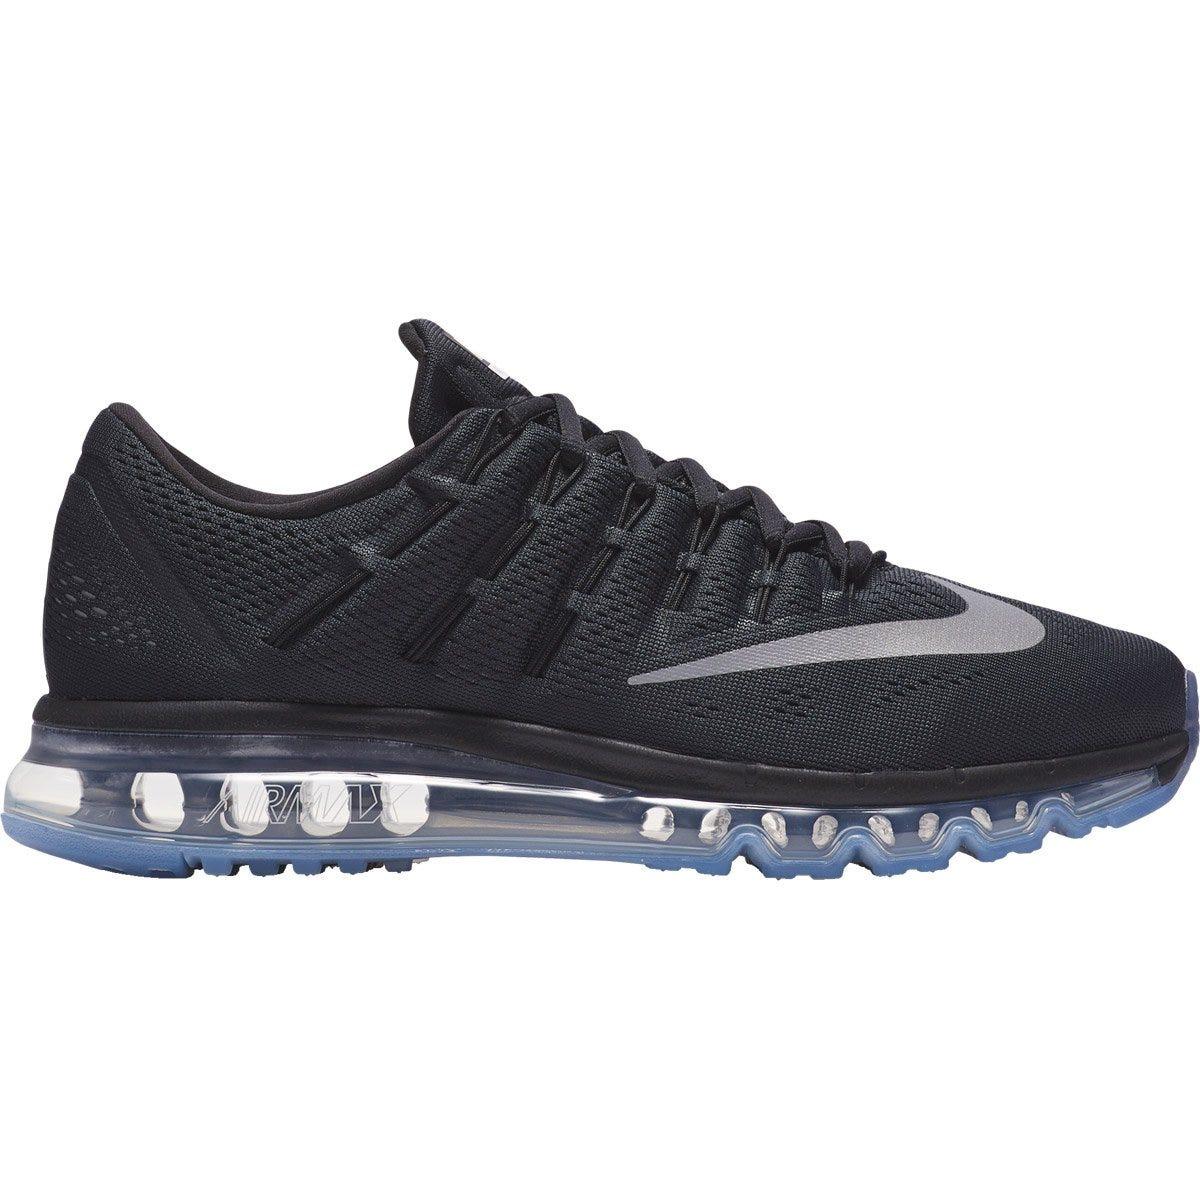 Nike Air Max 2016 Men's Training Shoes - Black/Dark Gray/White